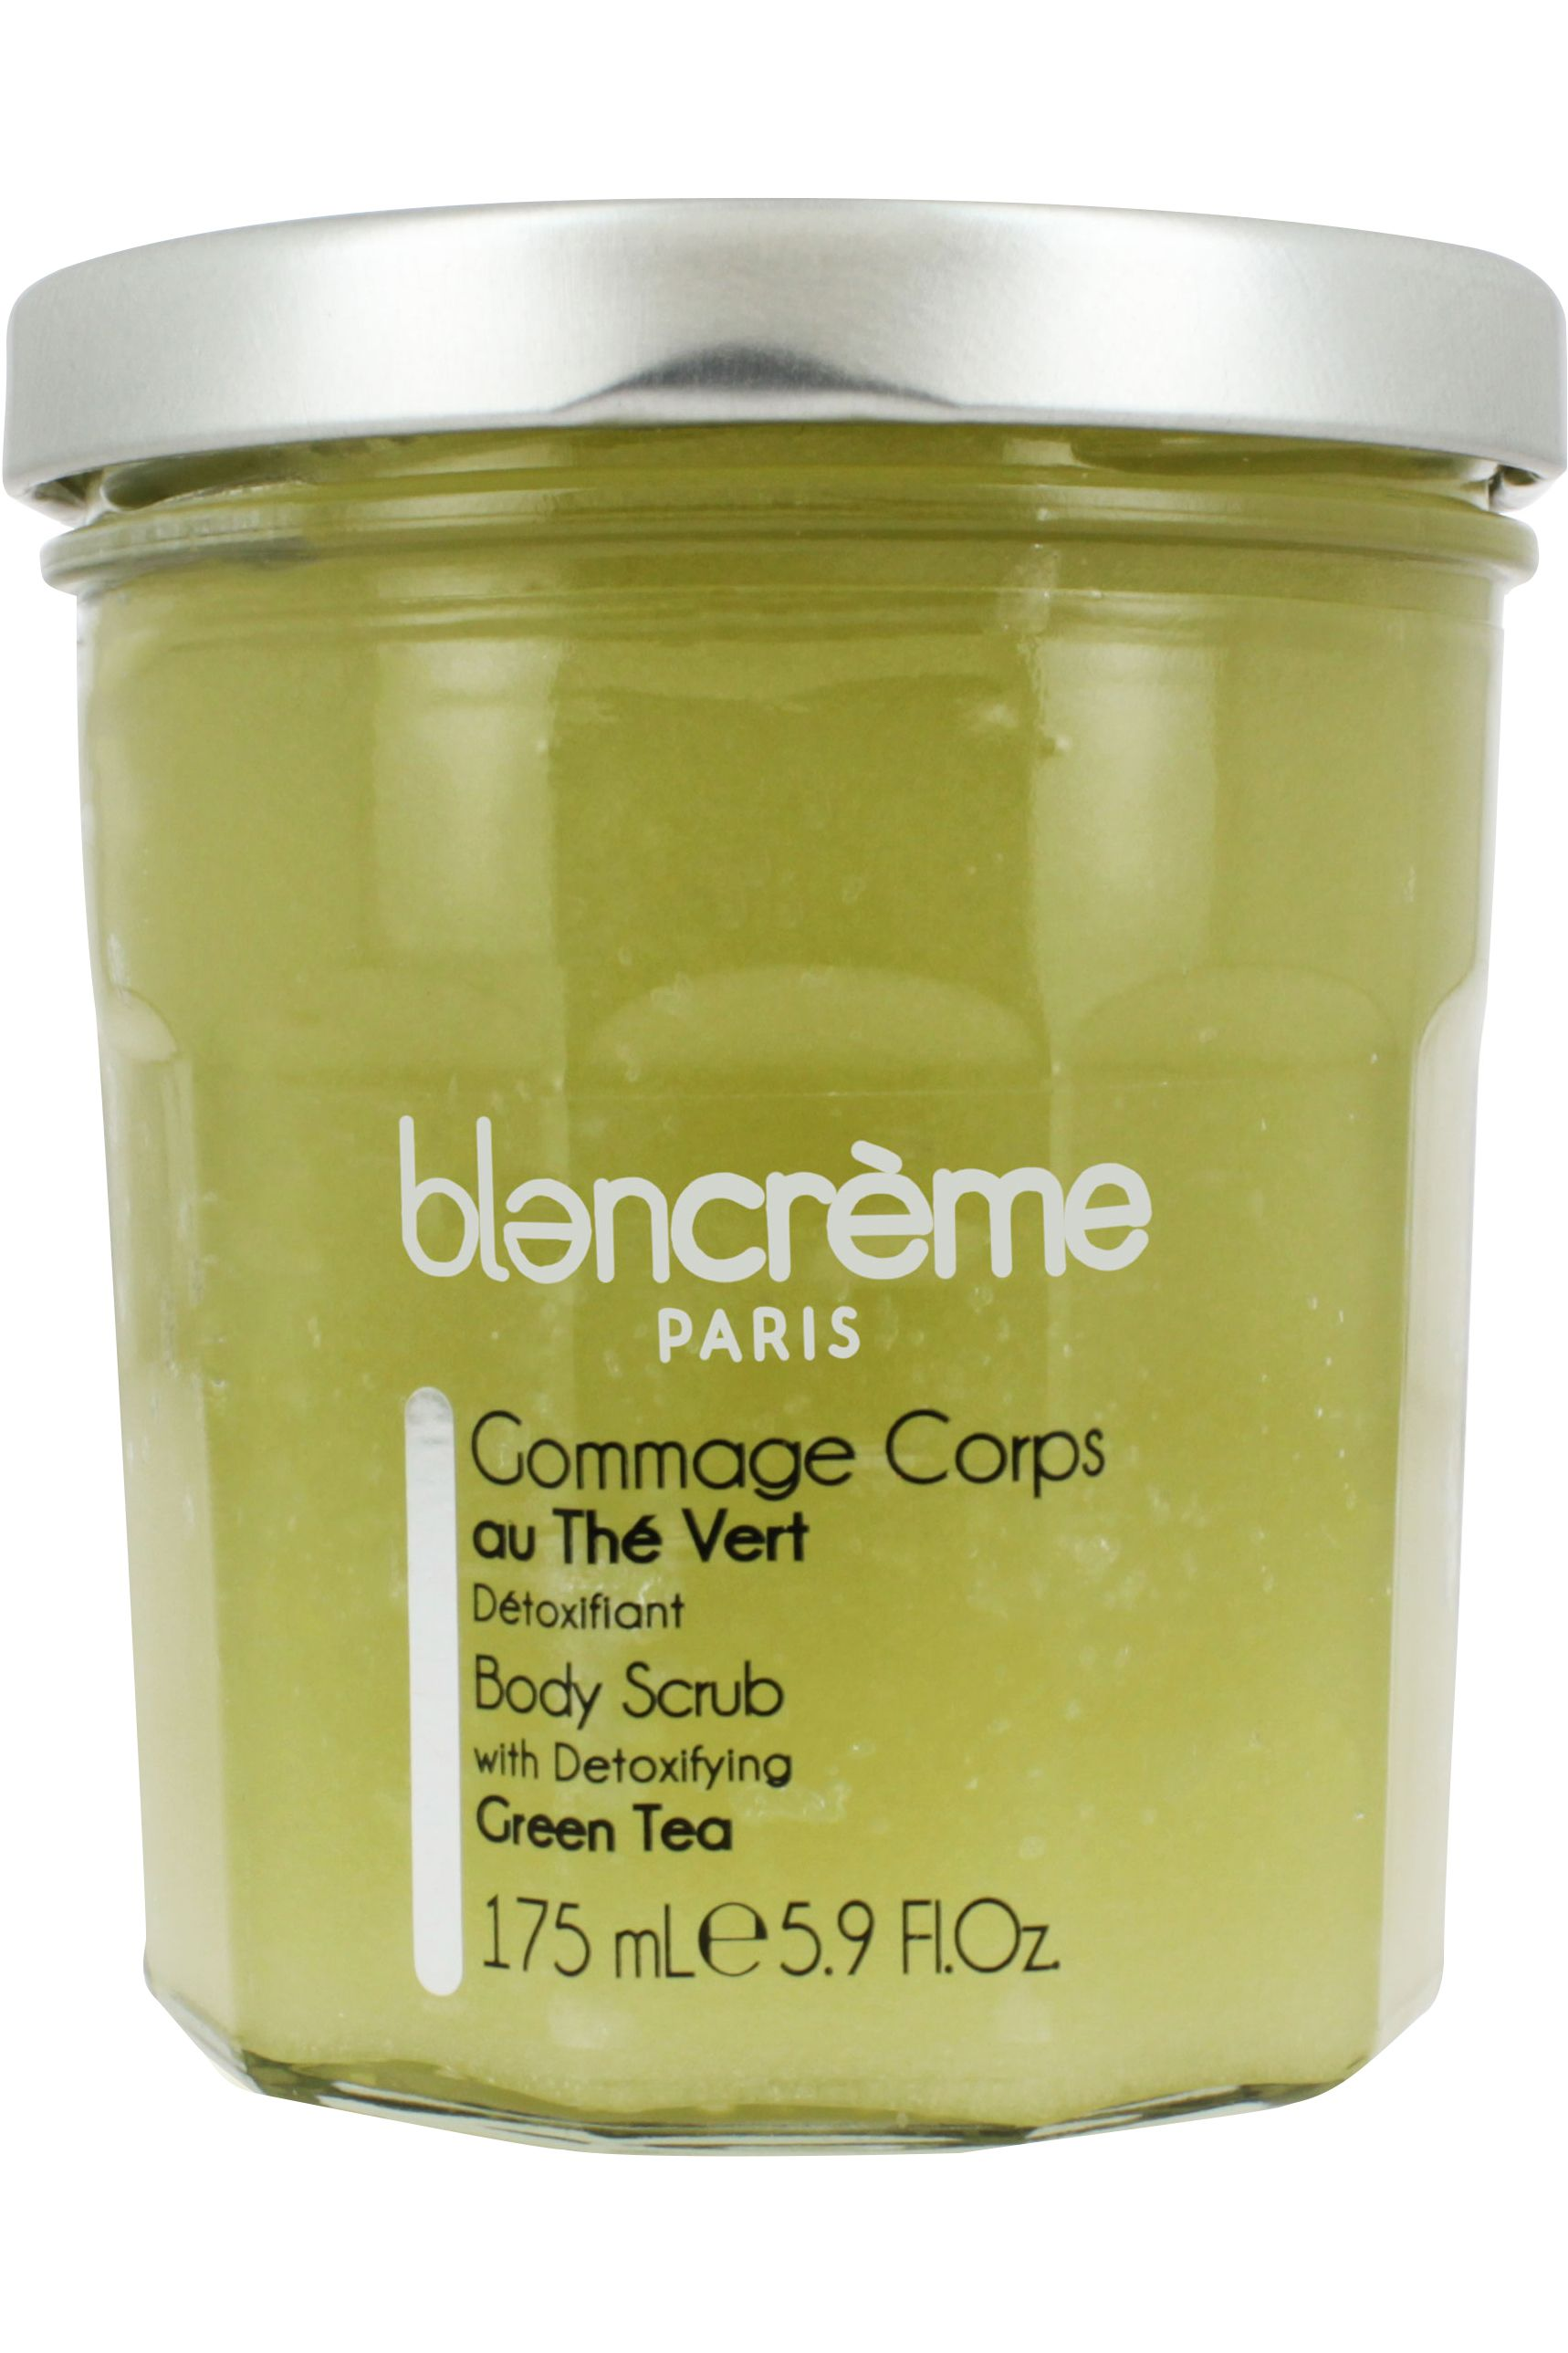 Blissim : Blancrème - Gommage Corps Thé Vert - Gommage Corps Thé Vert